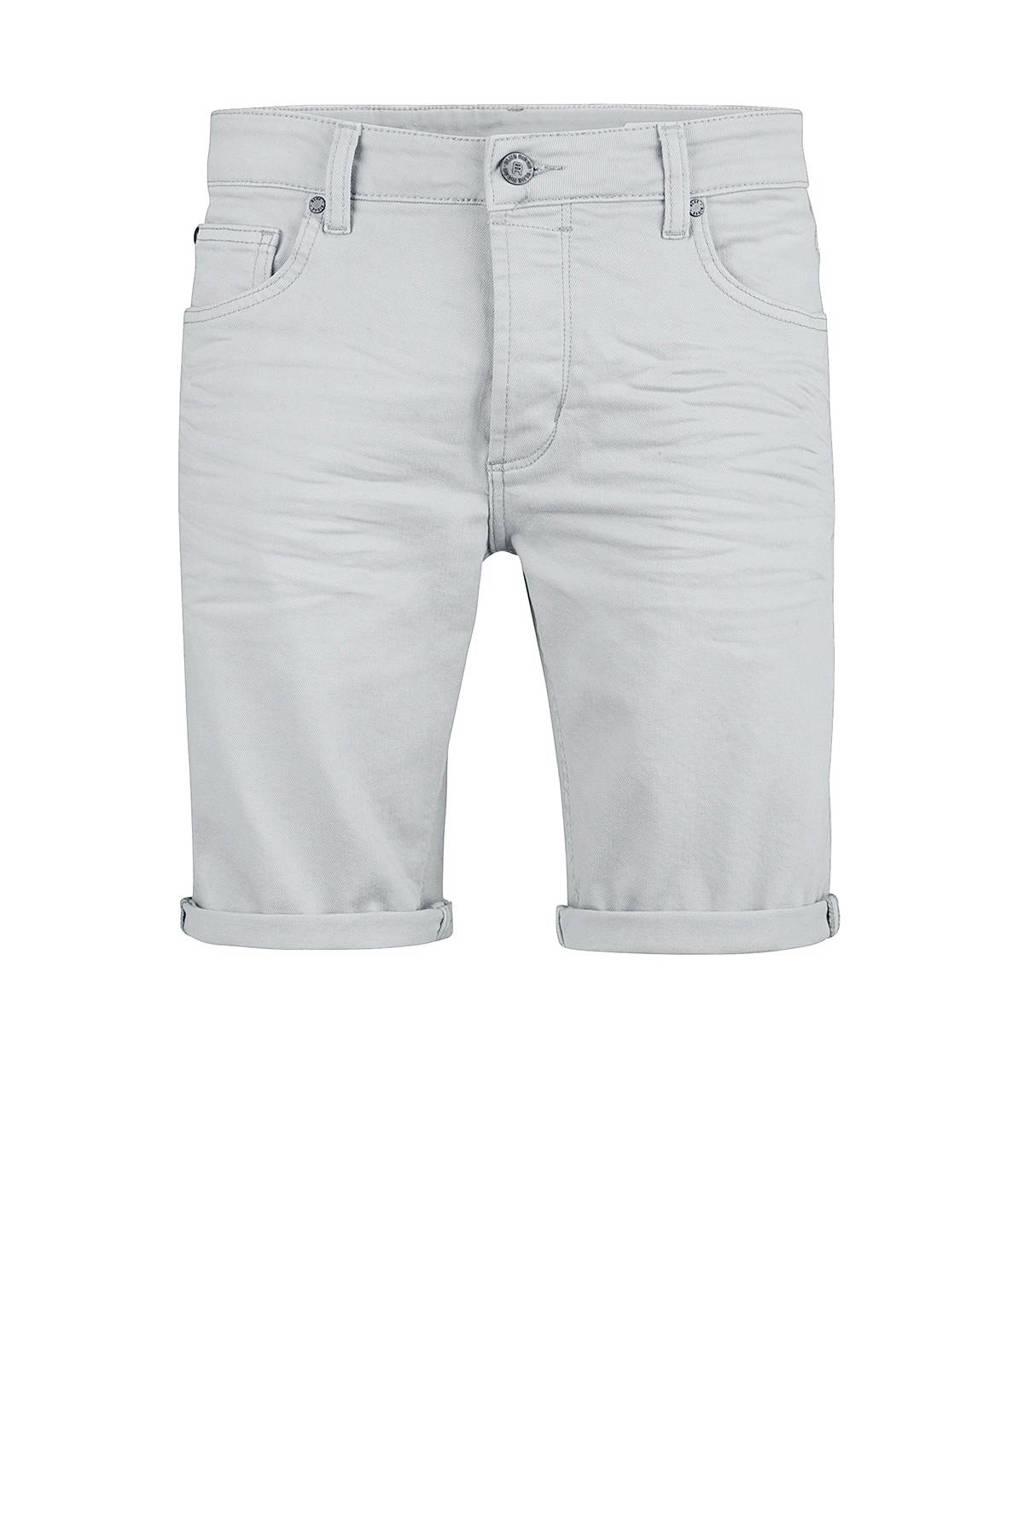 WE Fashion Blue Ridge regular fit jeans short grijsblauw, Grijsblauw